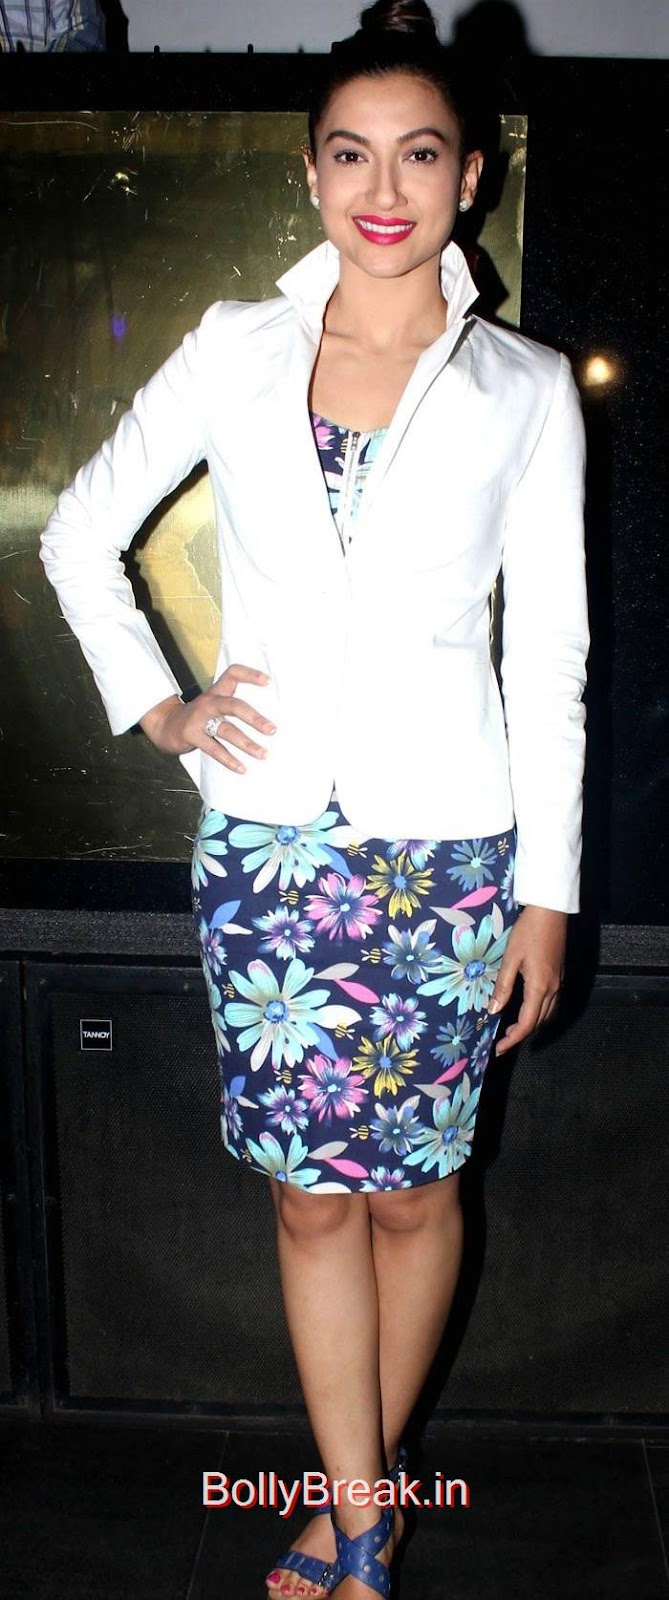 Gauhar Khan, Sofia Hayat hot Pics from her album Launch in black Dress